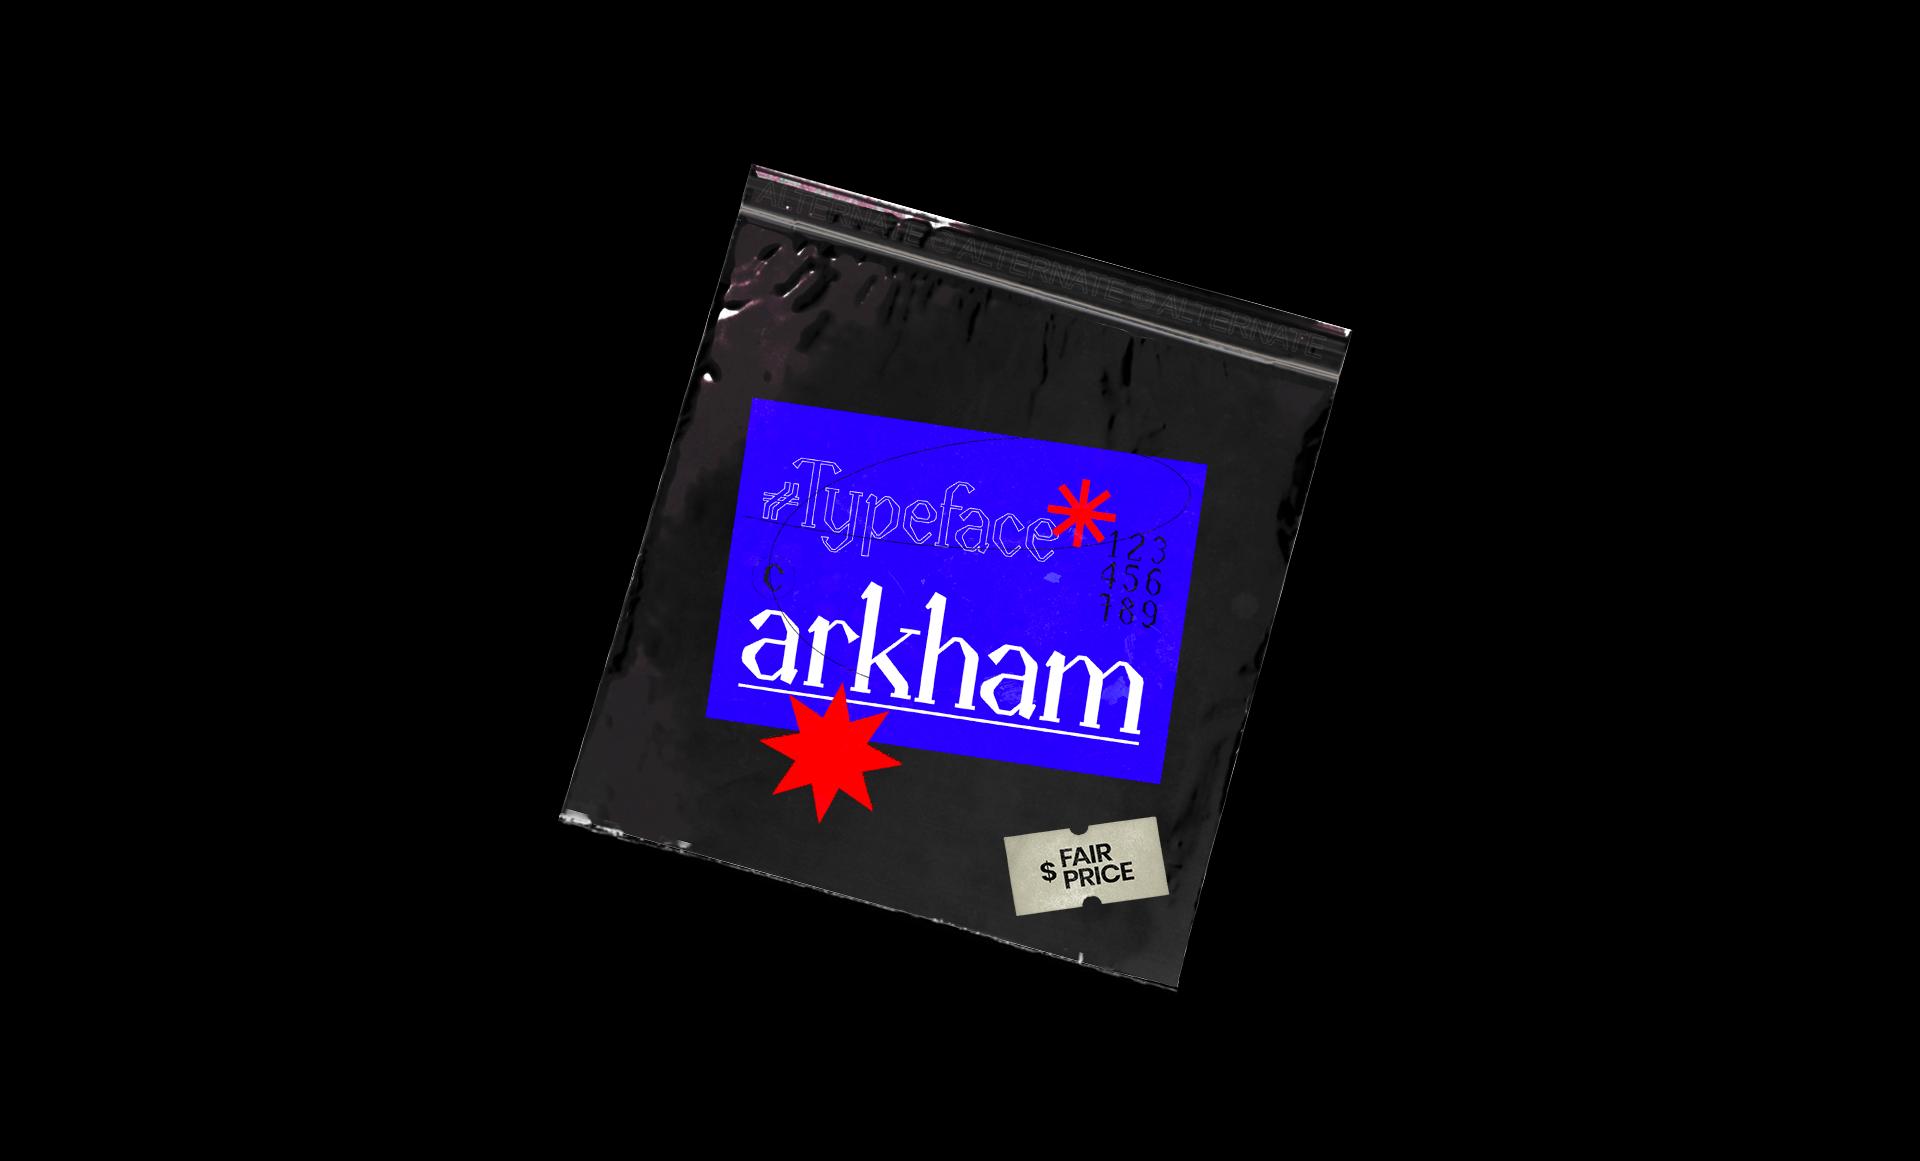 ArkhamArkham-copie-6